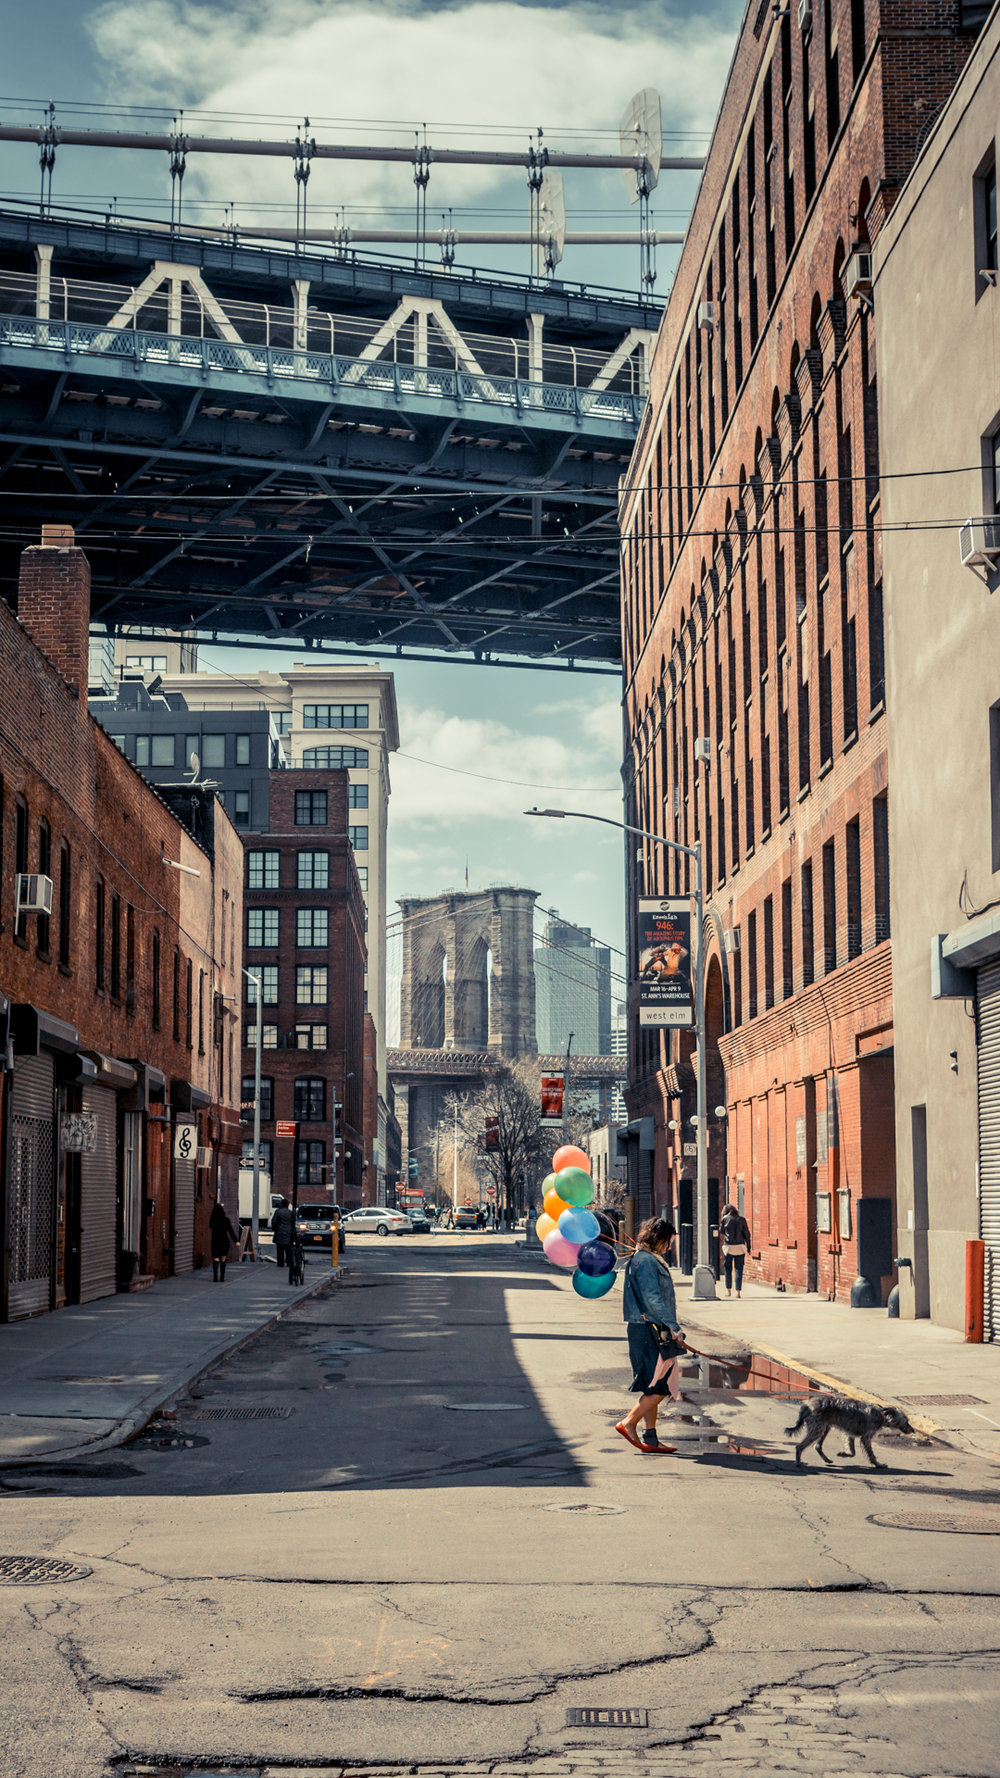 NYC_stijn_hoekstra-314.jpg